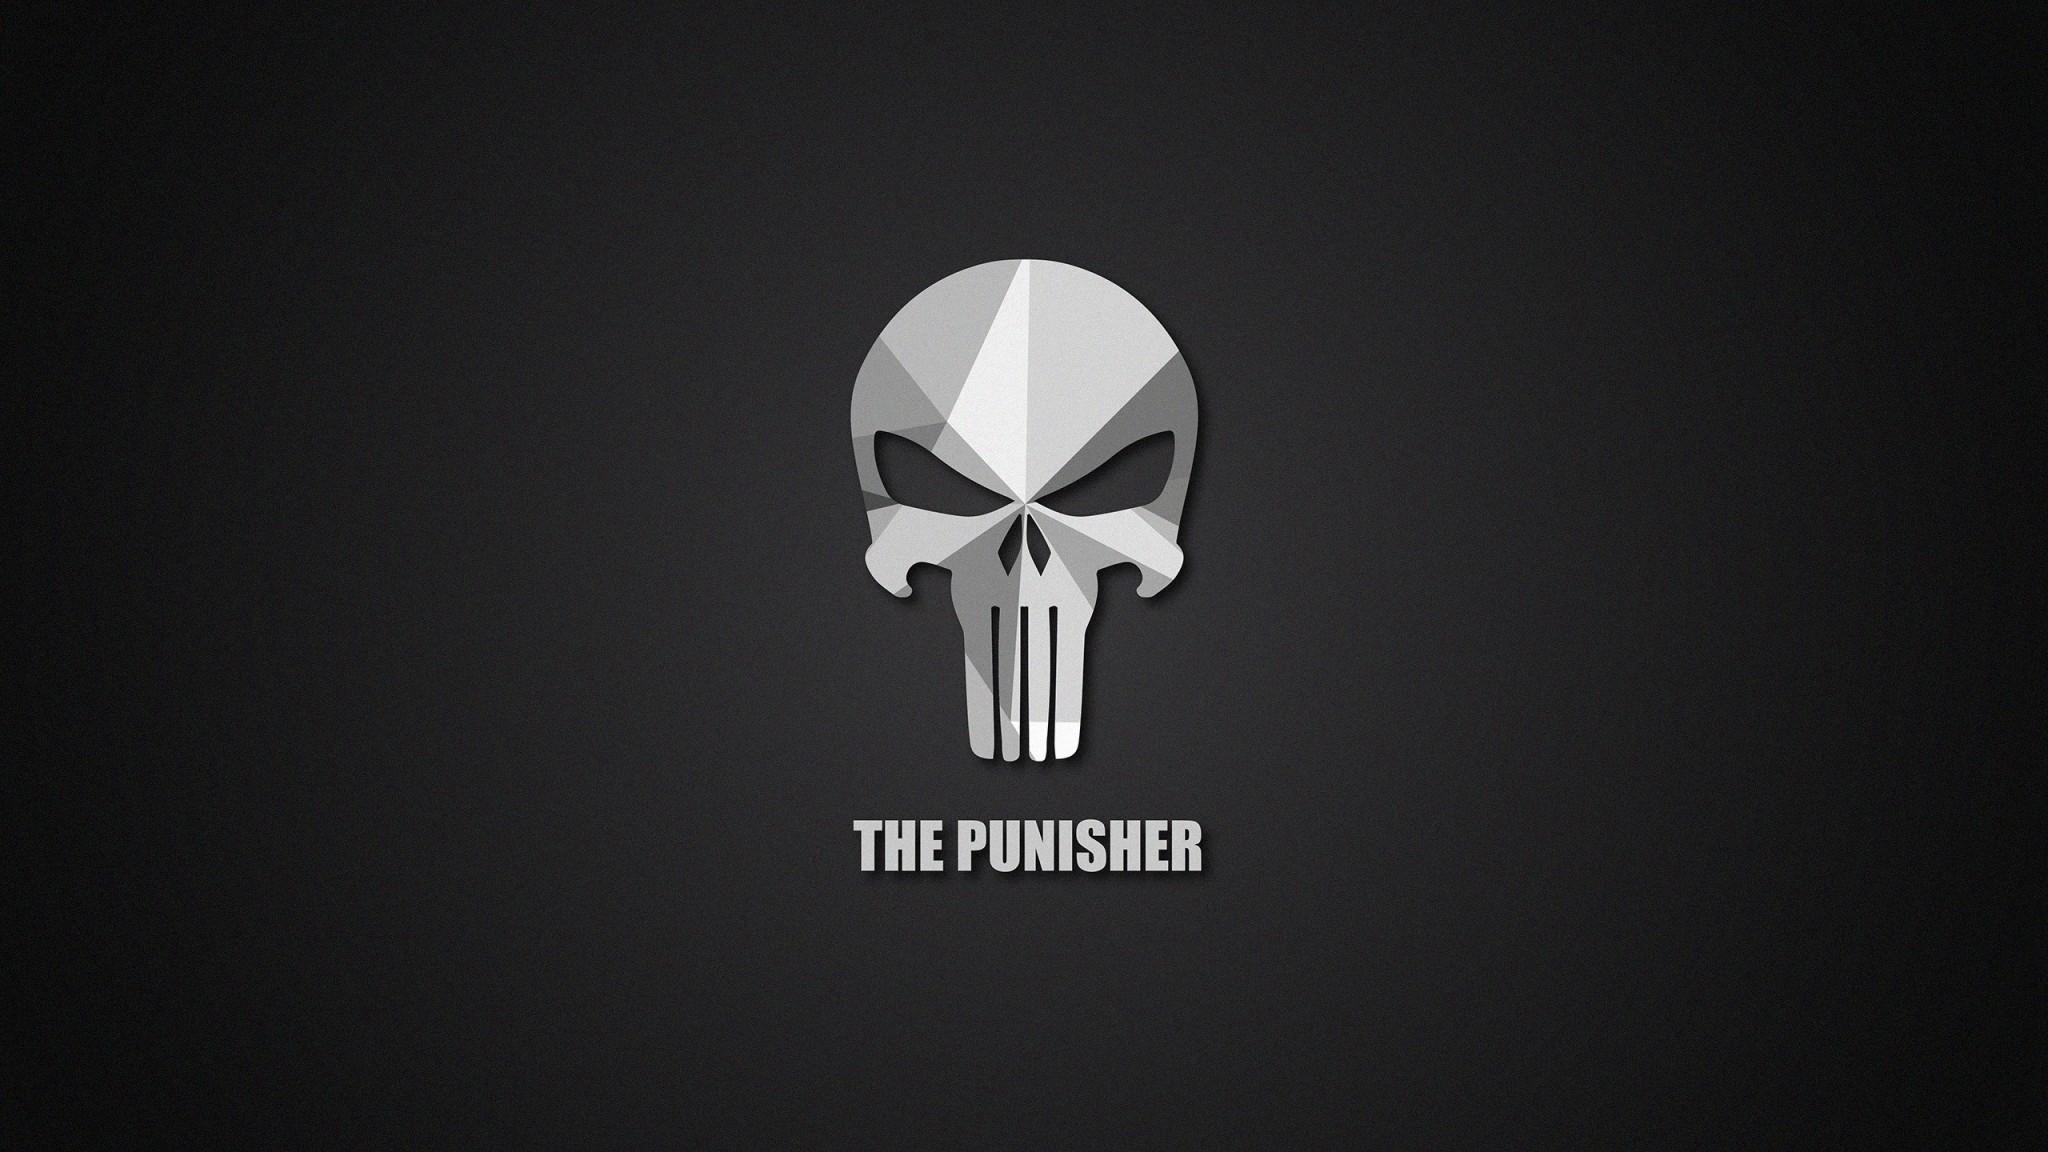 Punisher Logo Google Search Desktop Background